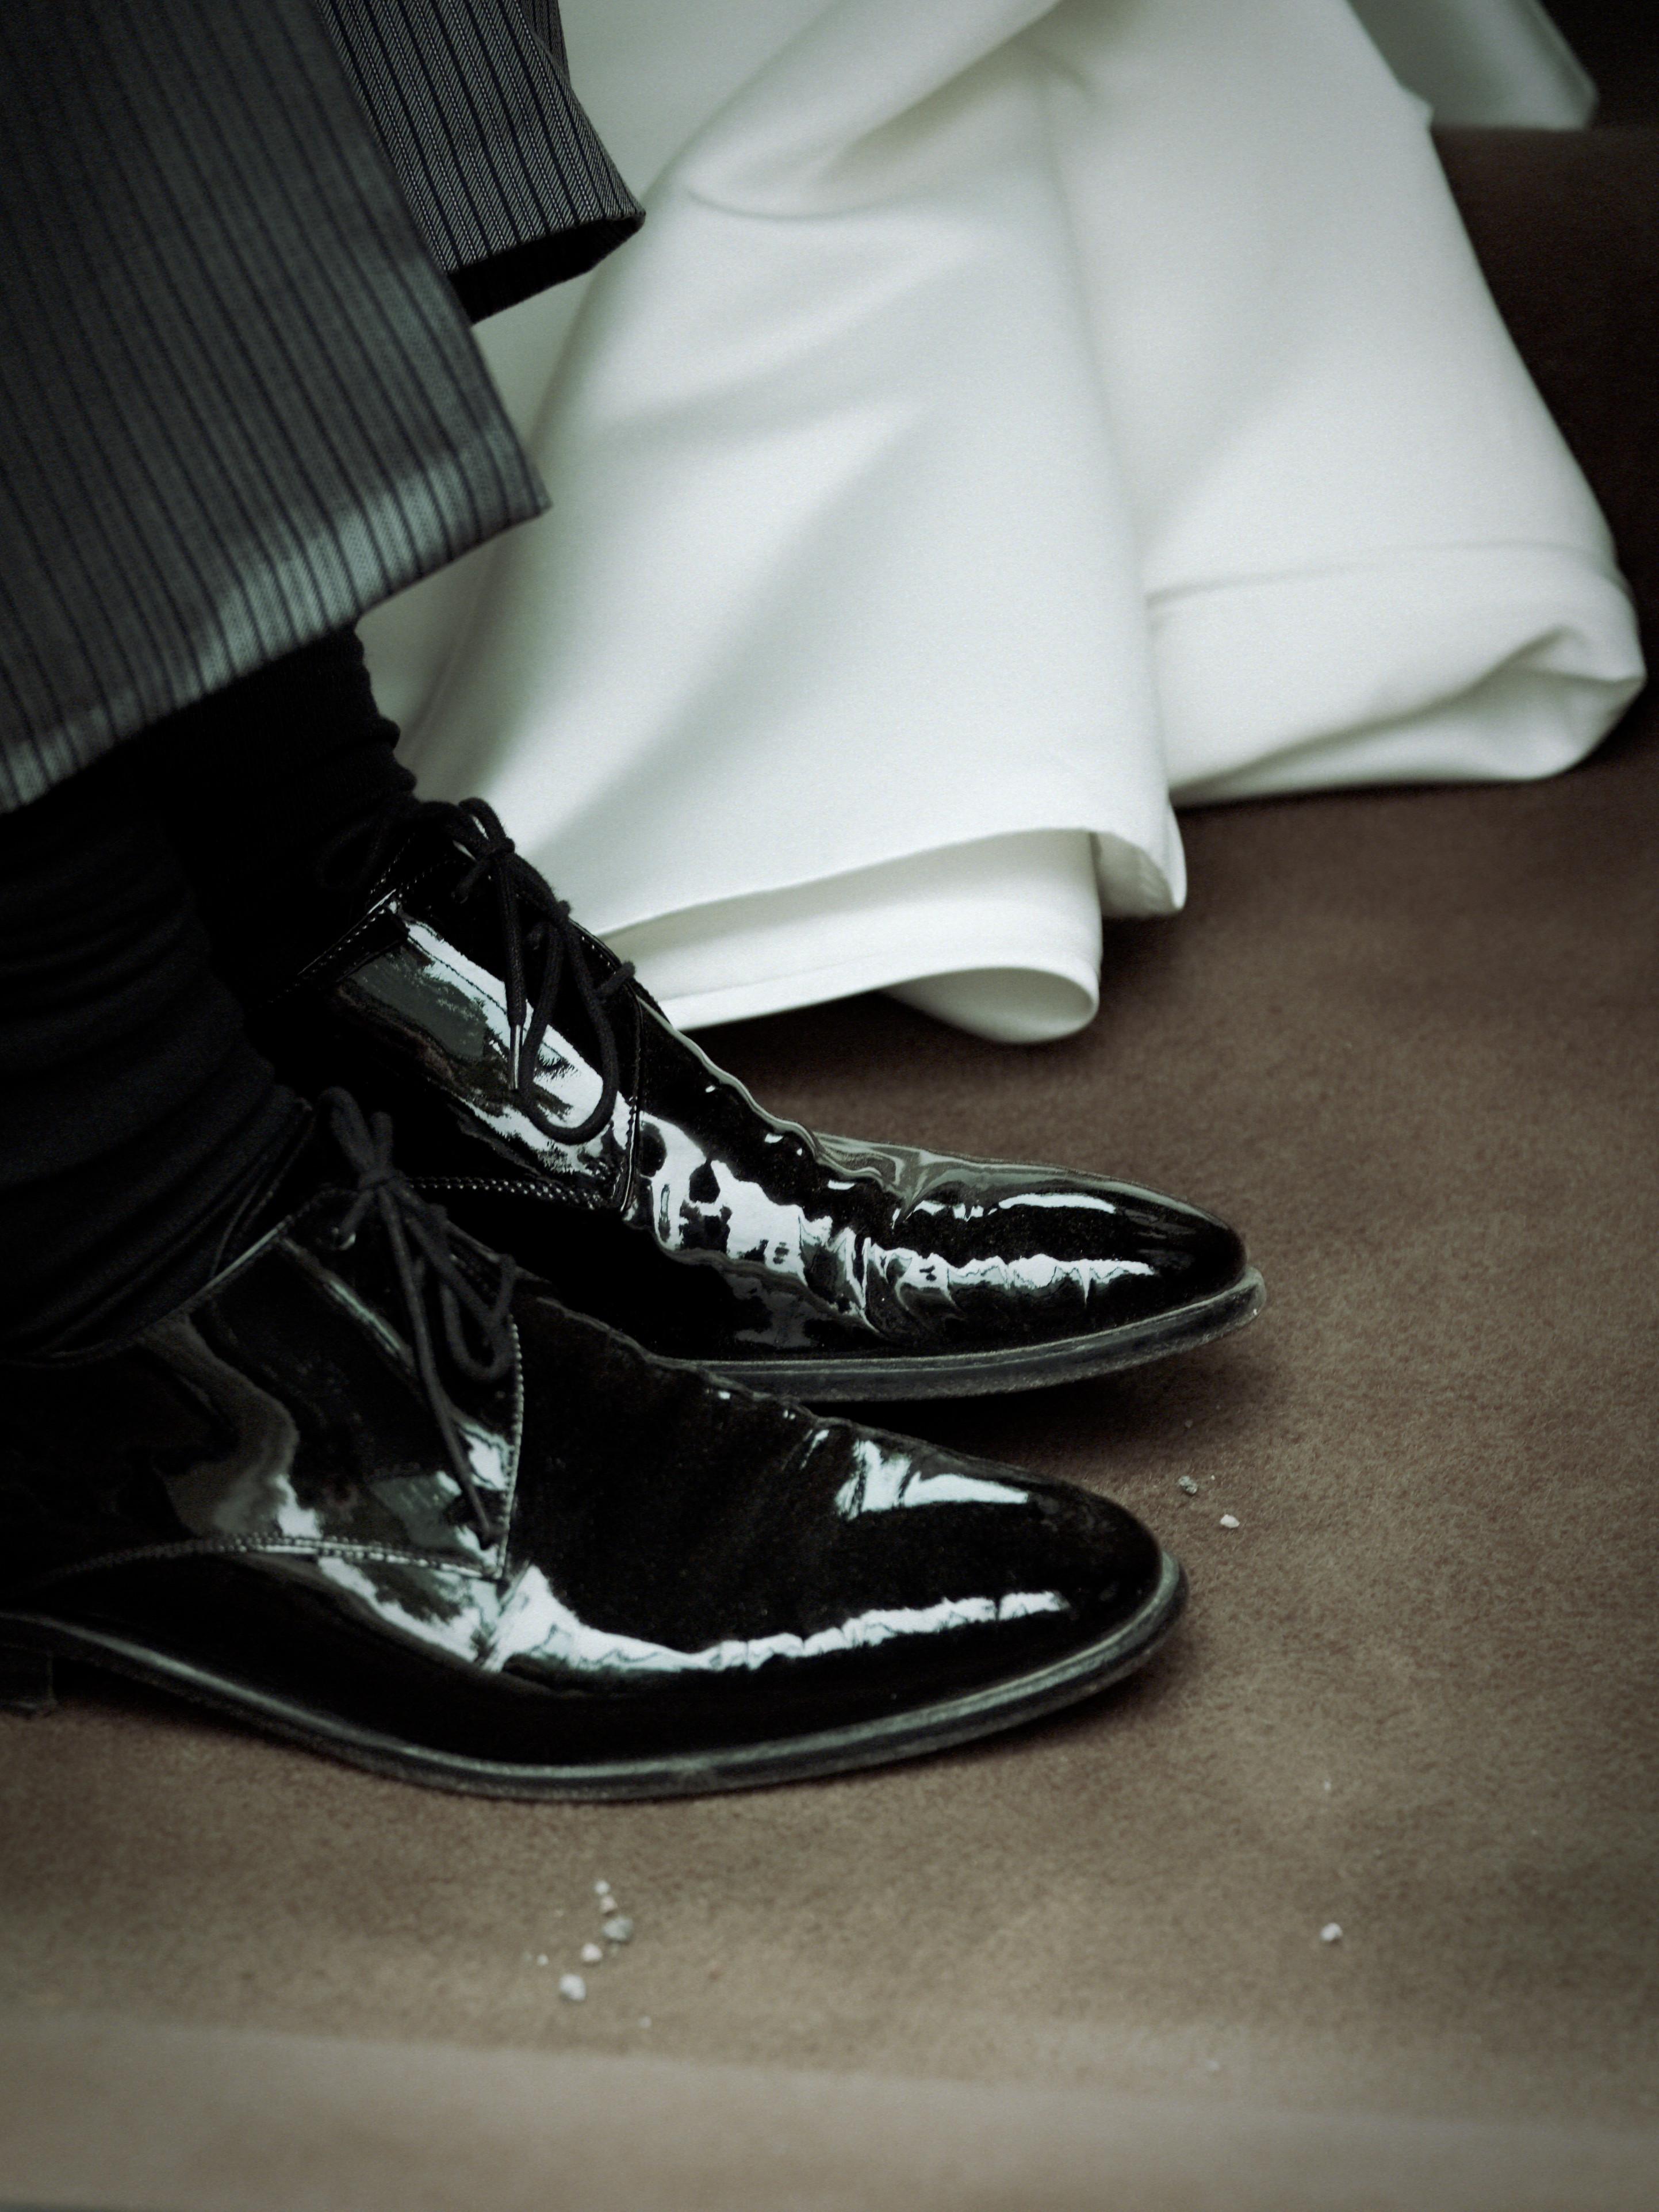 Bröllopsbilen 2 - skor